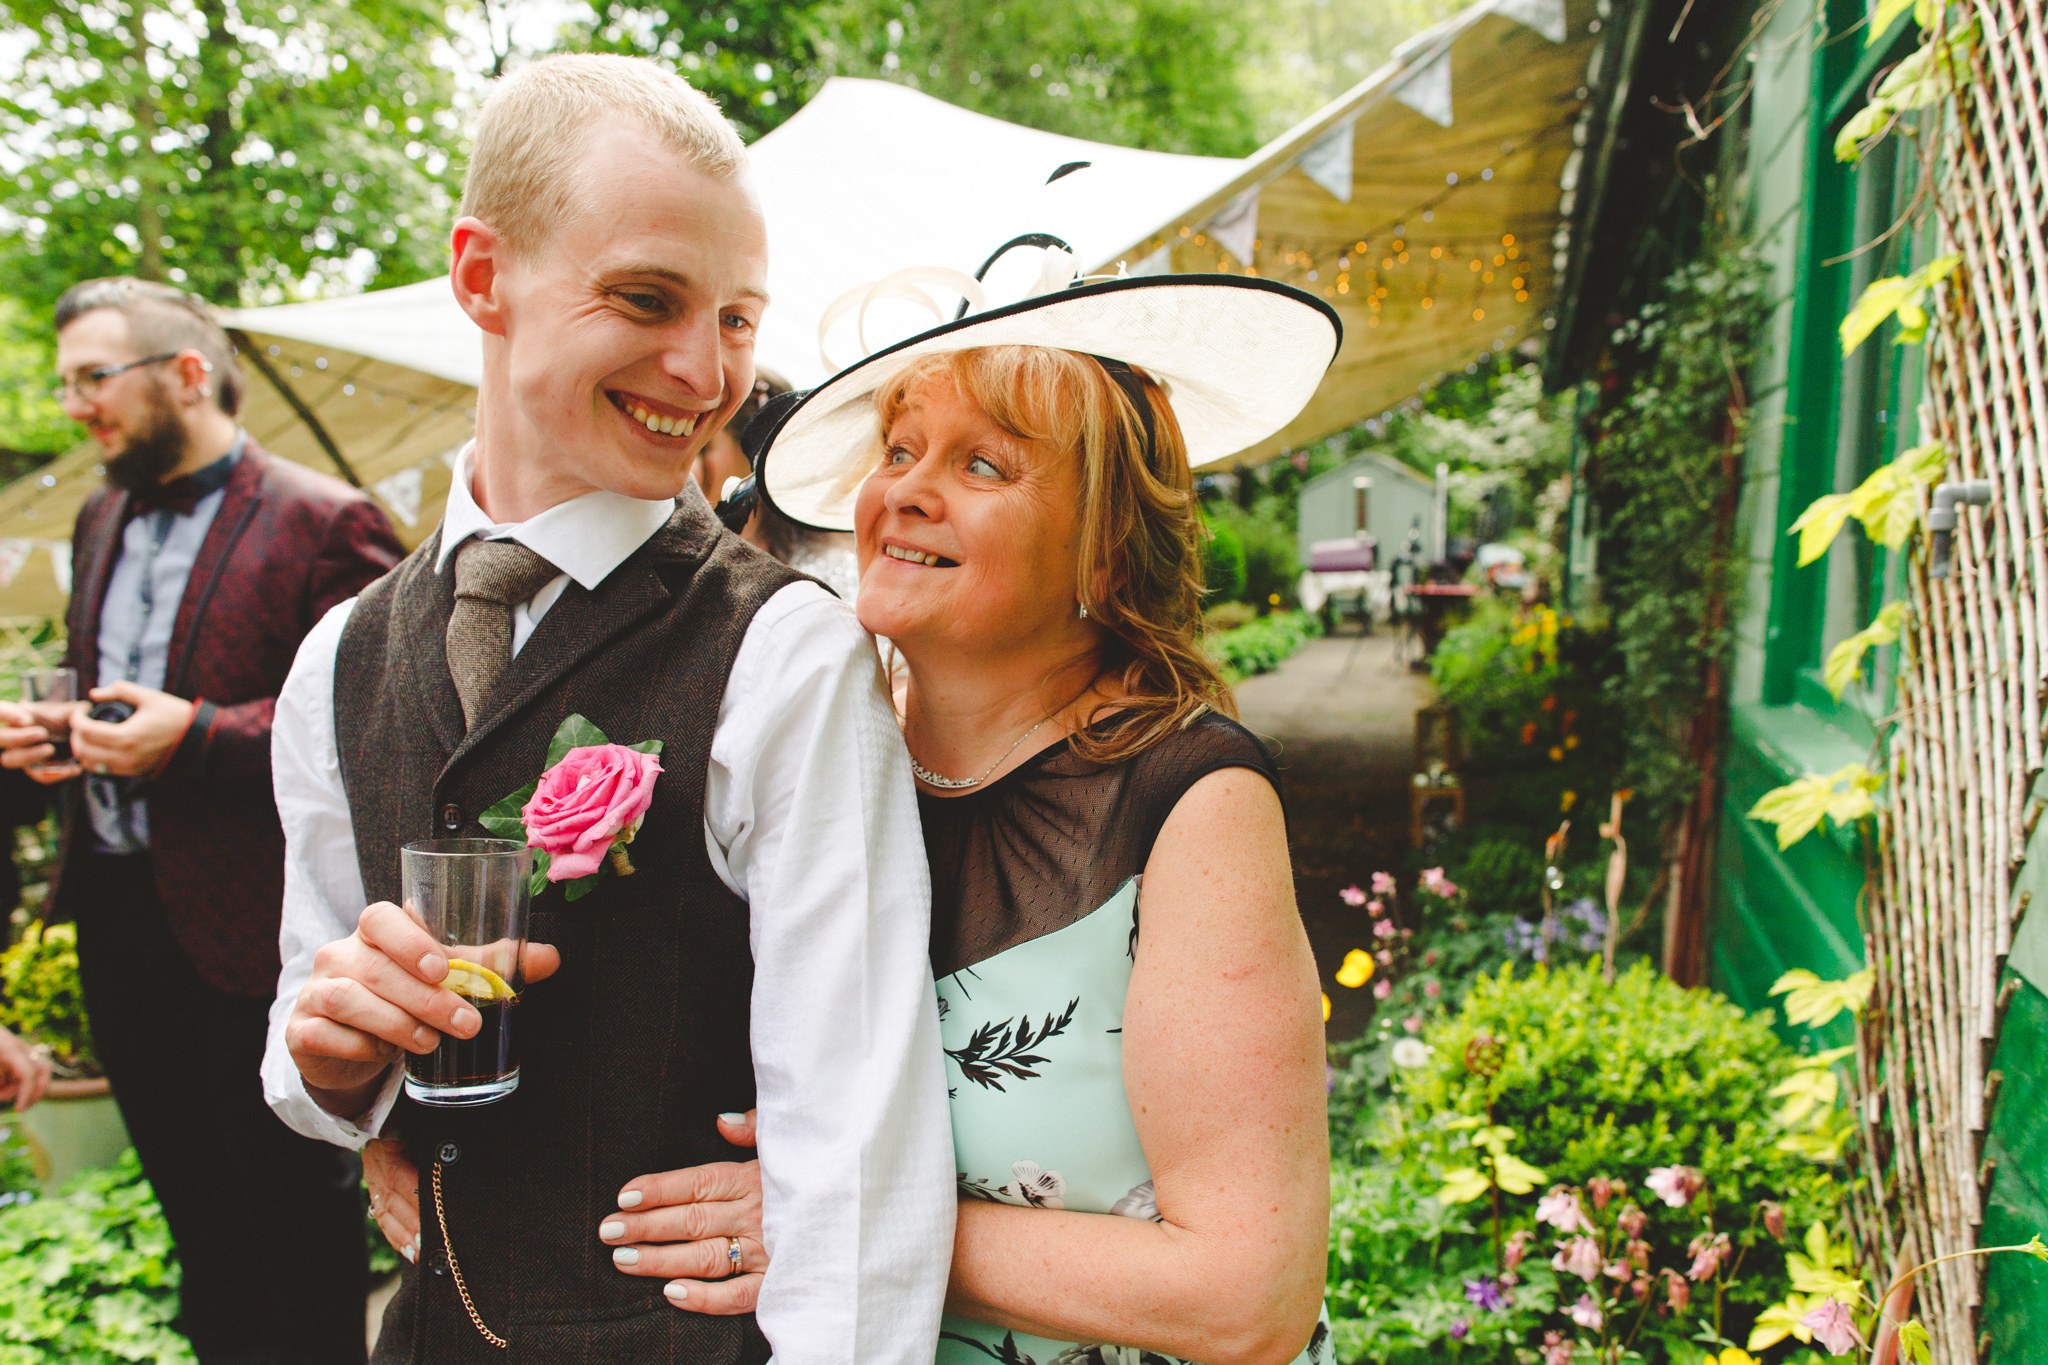 derbyshire-wedding-photographer-videographer-camera-hannah-25.jpg